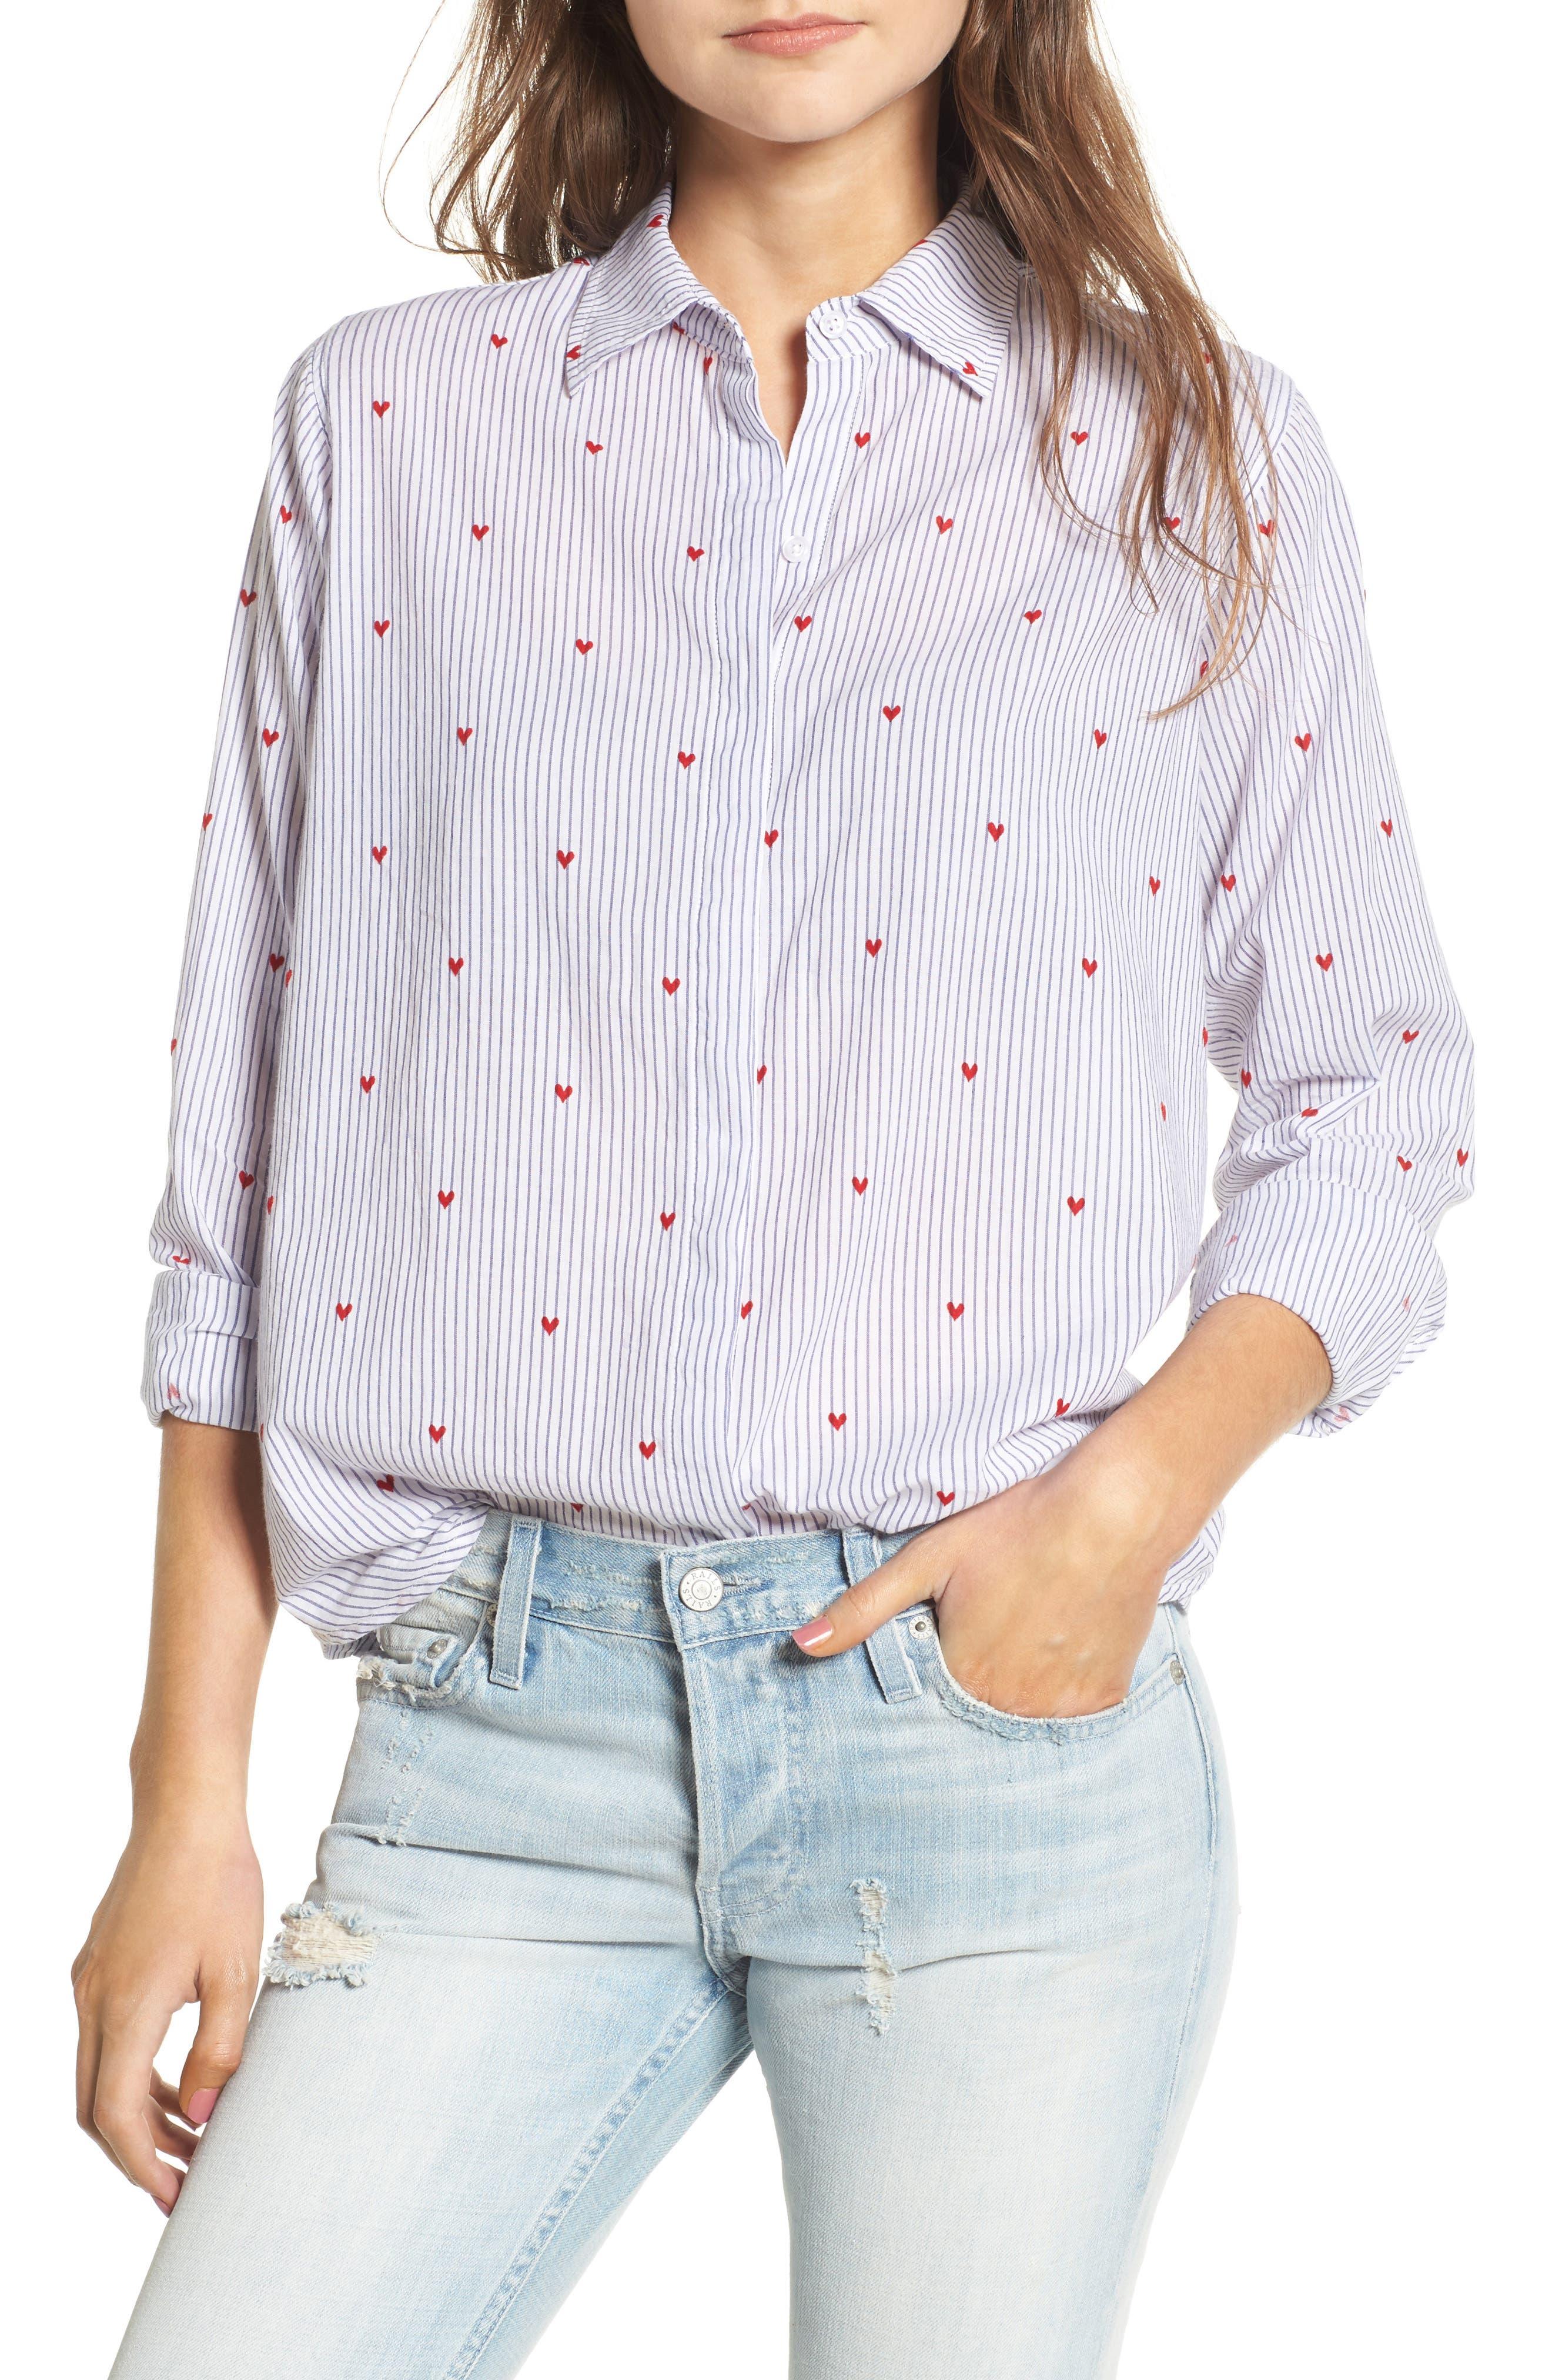 Taylor Heart Stripe Shirt,                         Main,                         color, 400